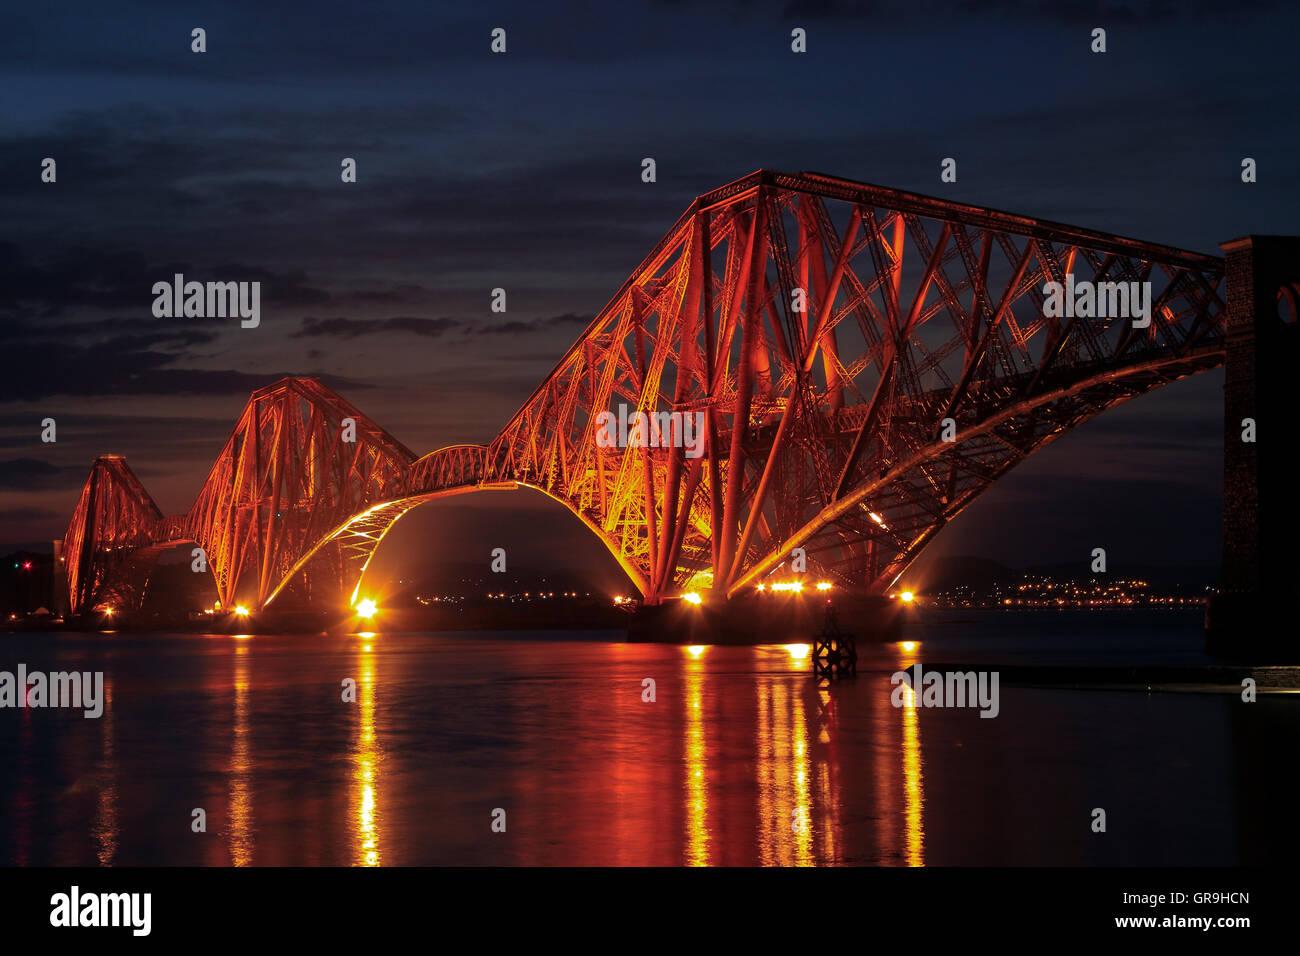 The Forth Bridge illuminated at night, South Queensferry, Lothian, Scotland, UK - Stock Image